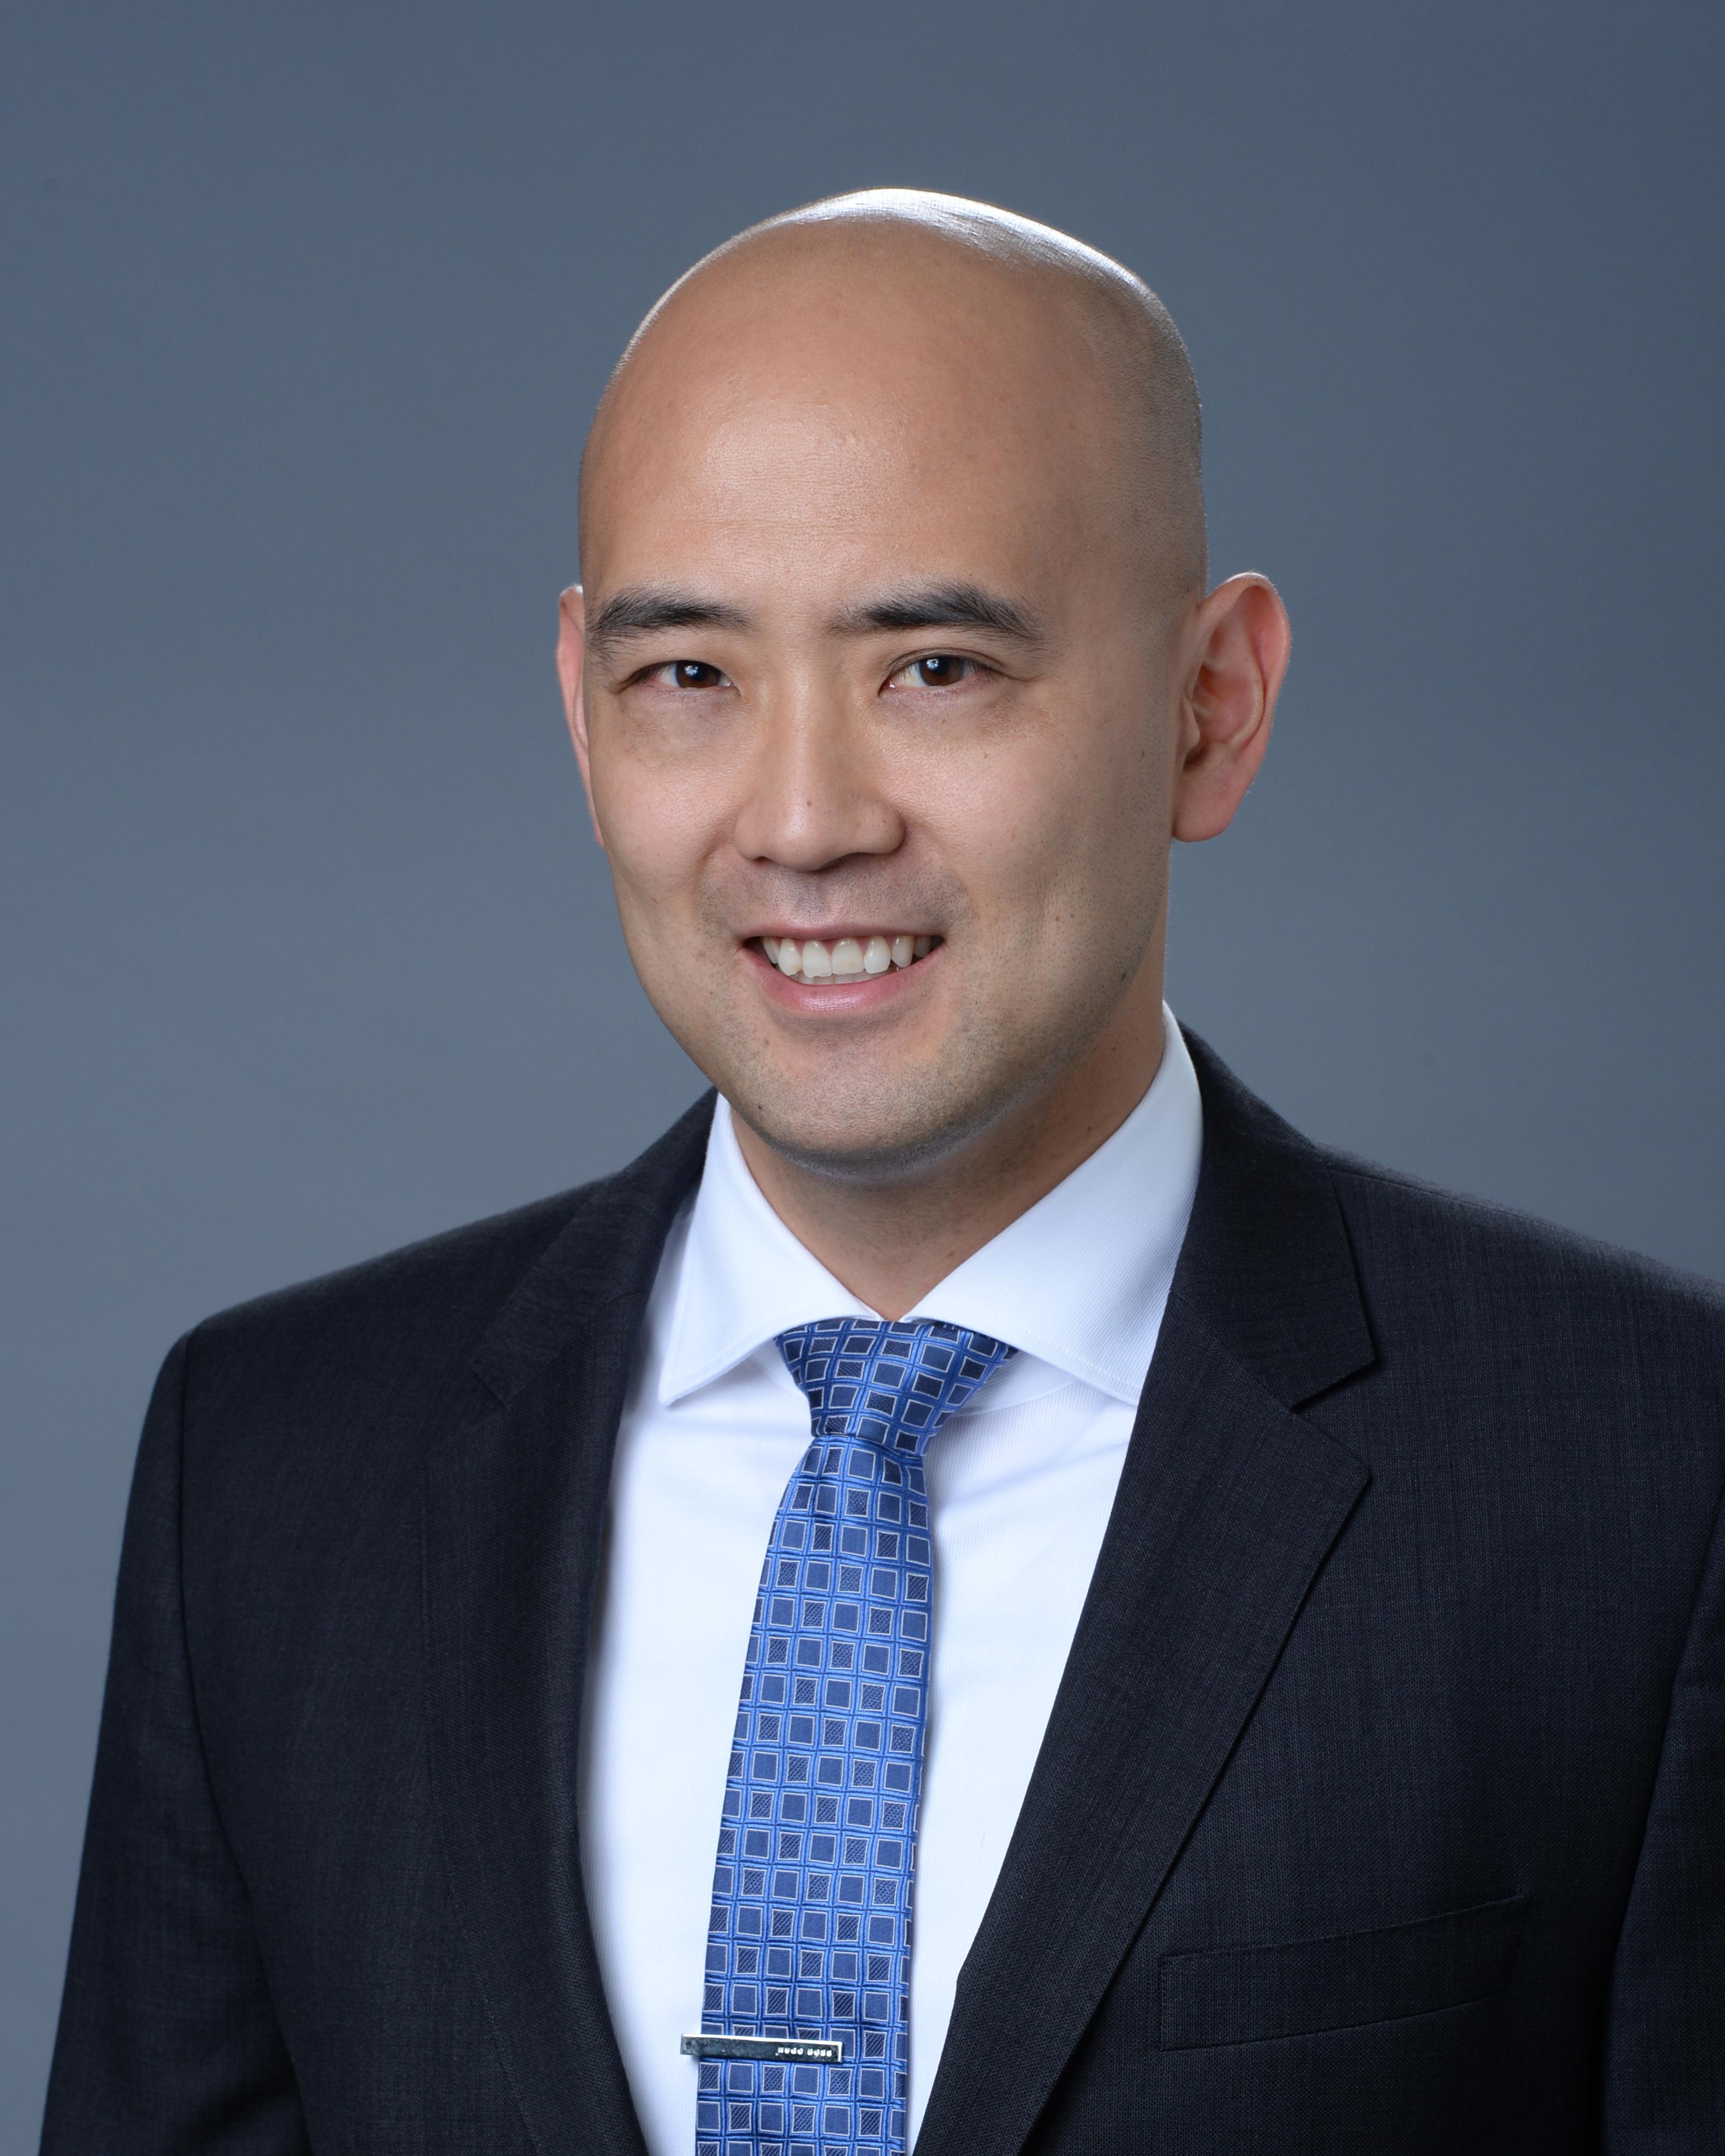 Benjamin J. Kim (Photo: Business Wire)